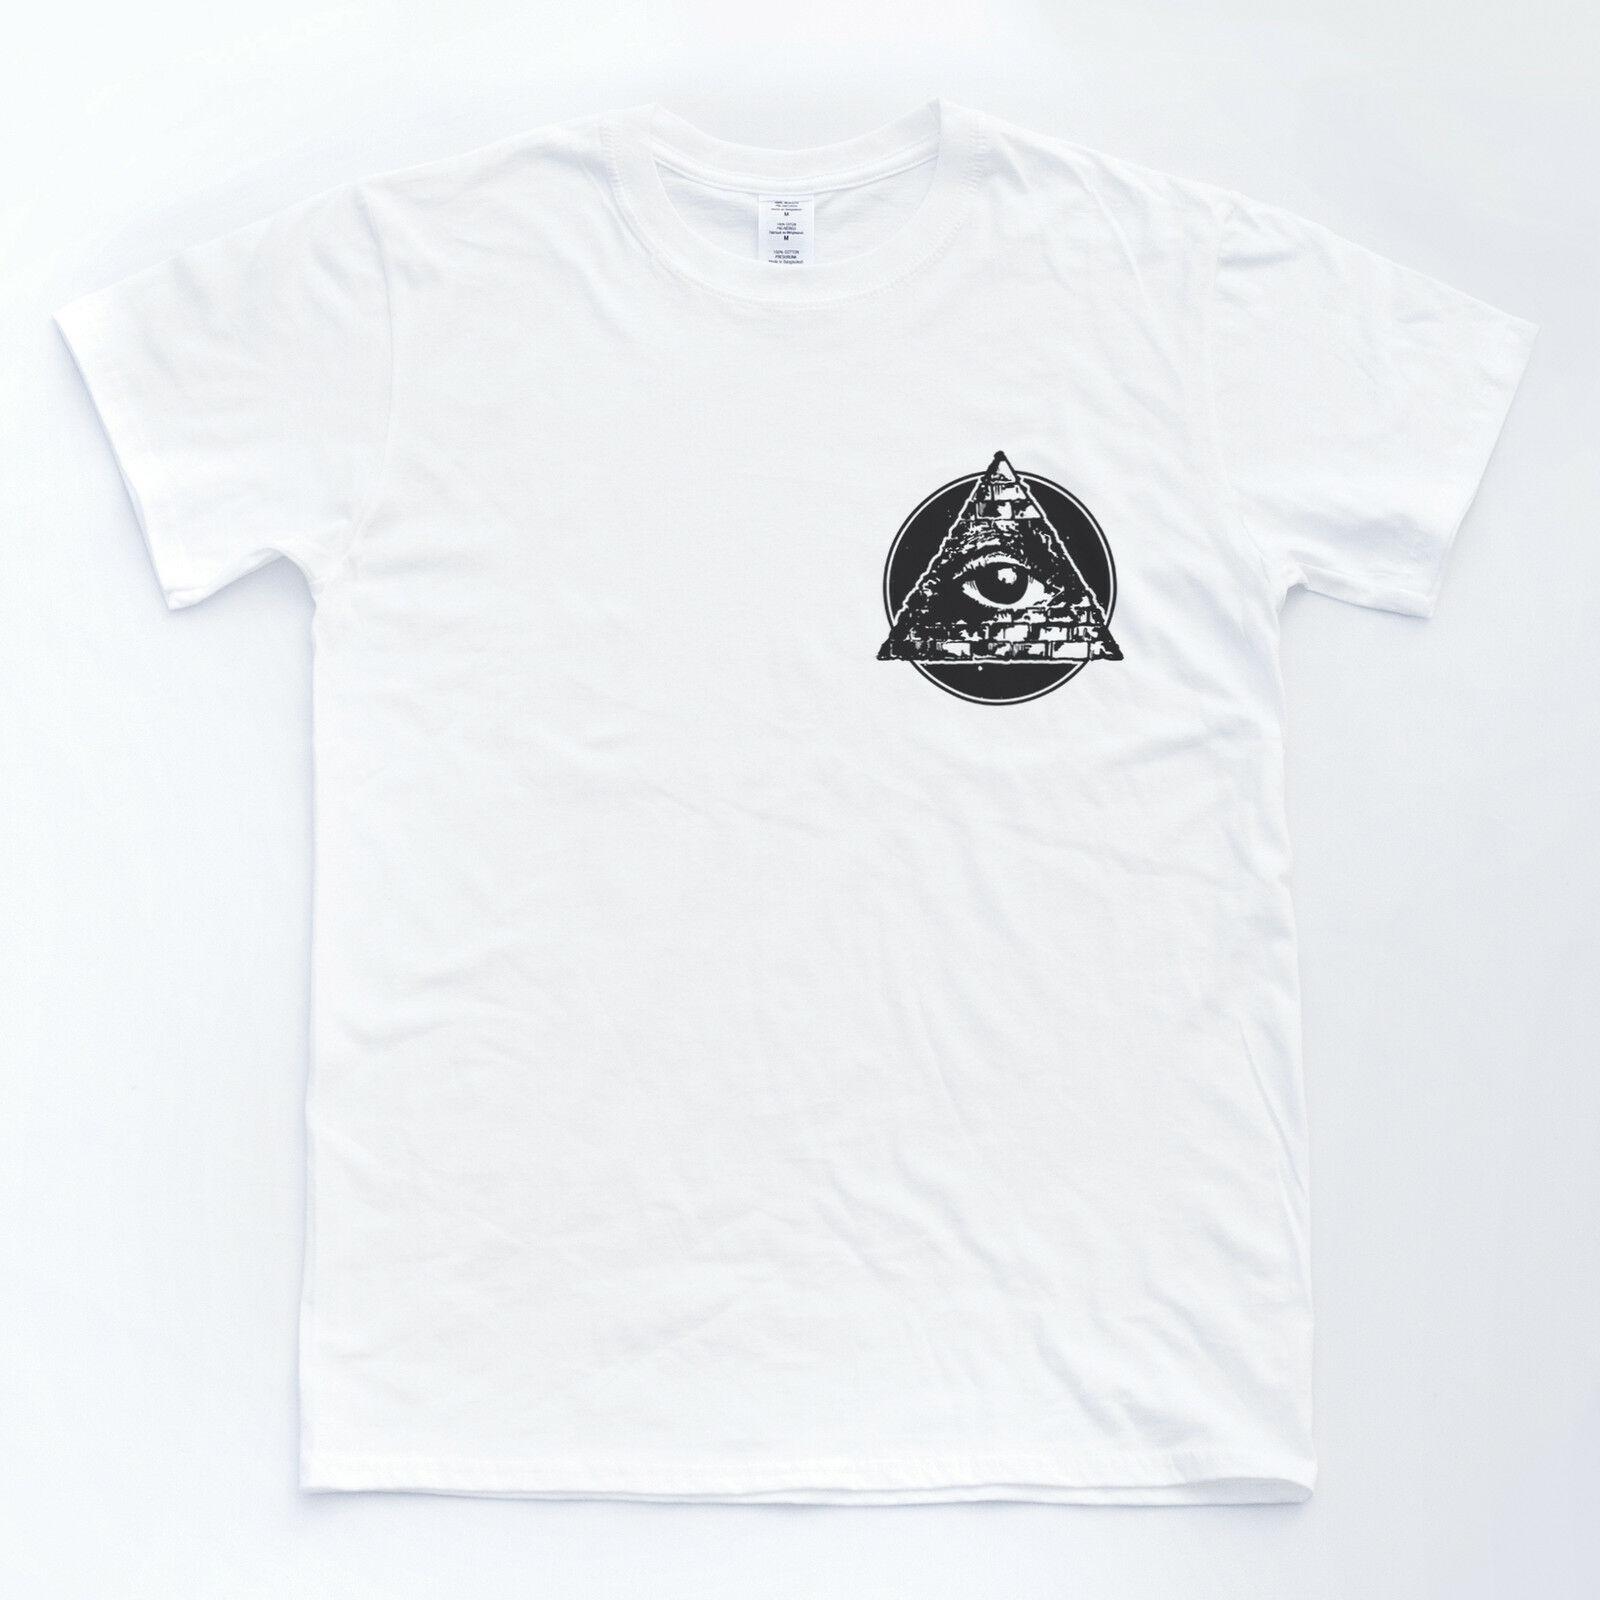 ILLUMINATI insignia LOGO pirámide ocultismo Skater Top Hipster símbolo ojo camiseta